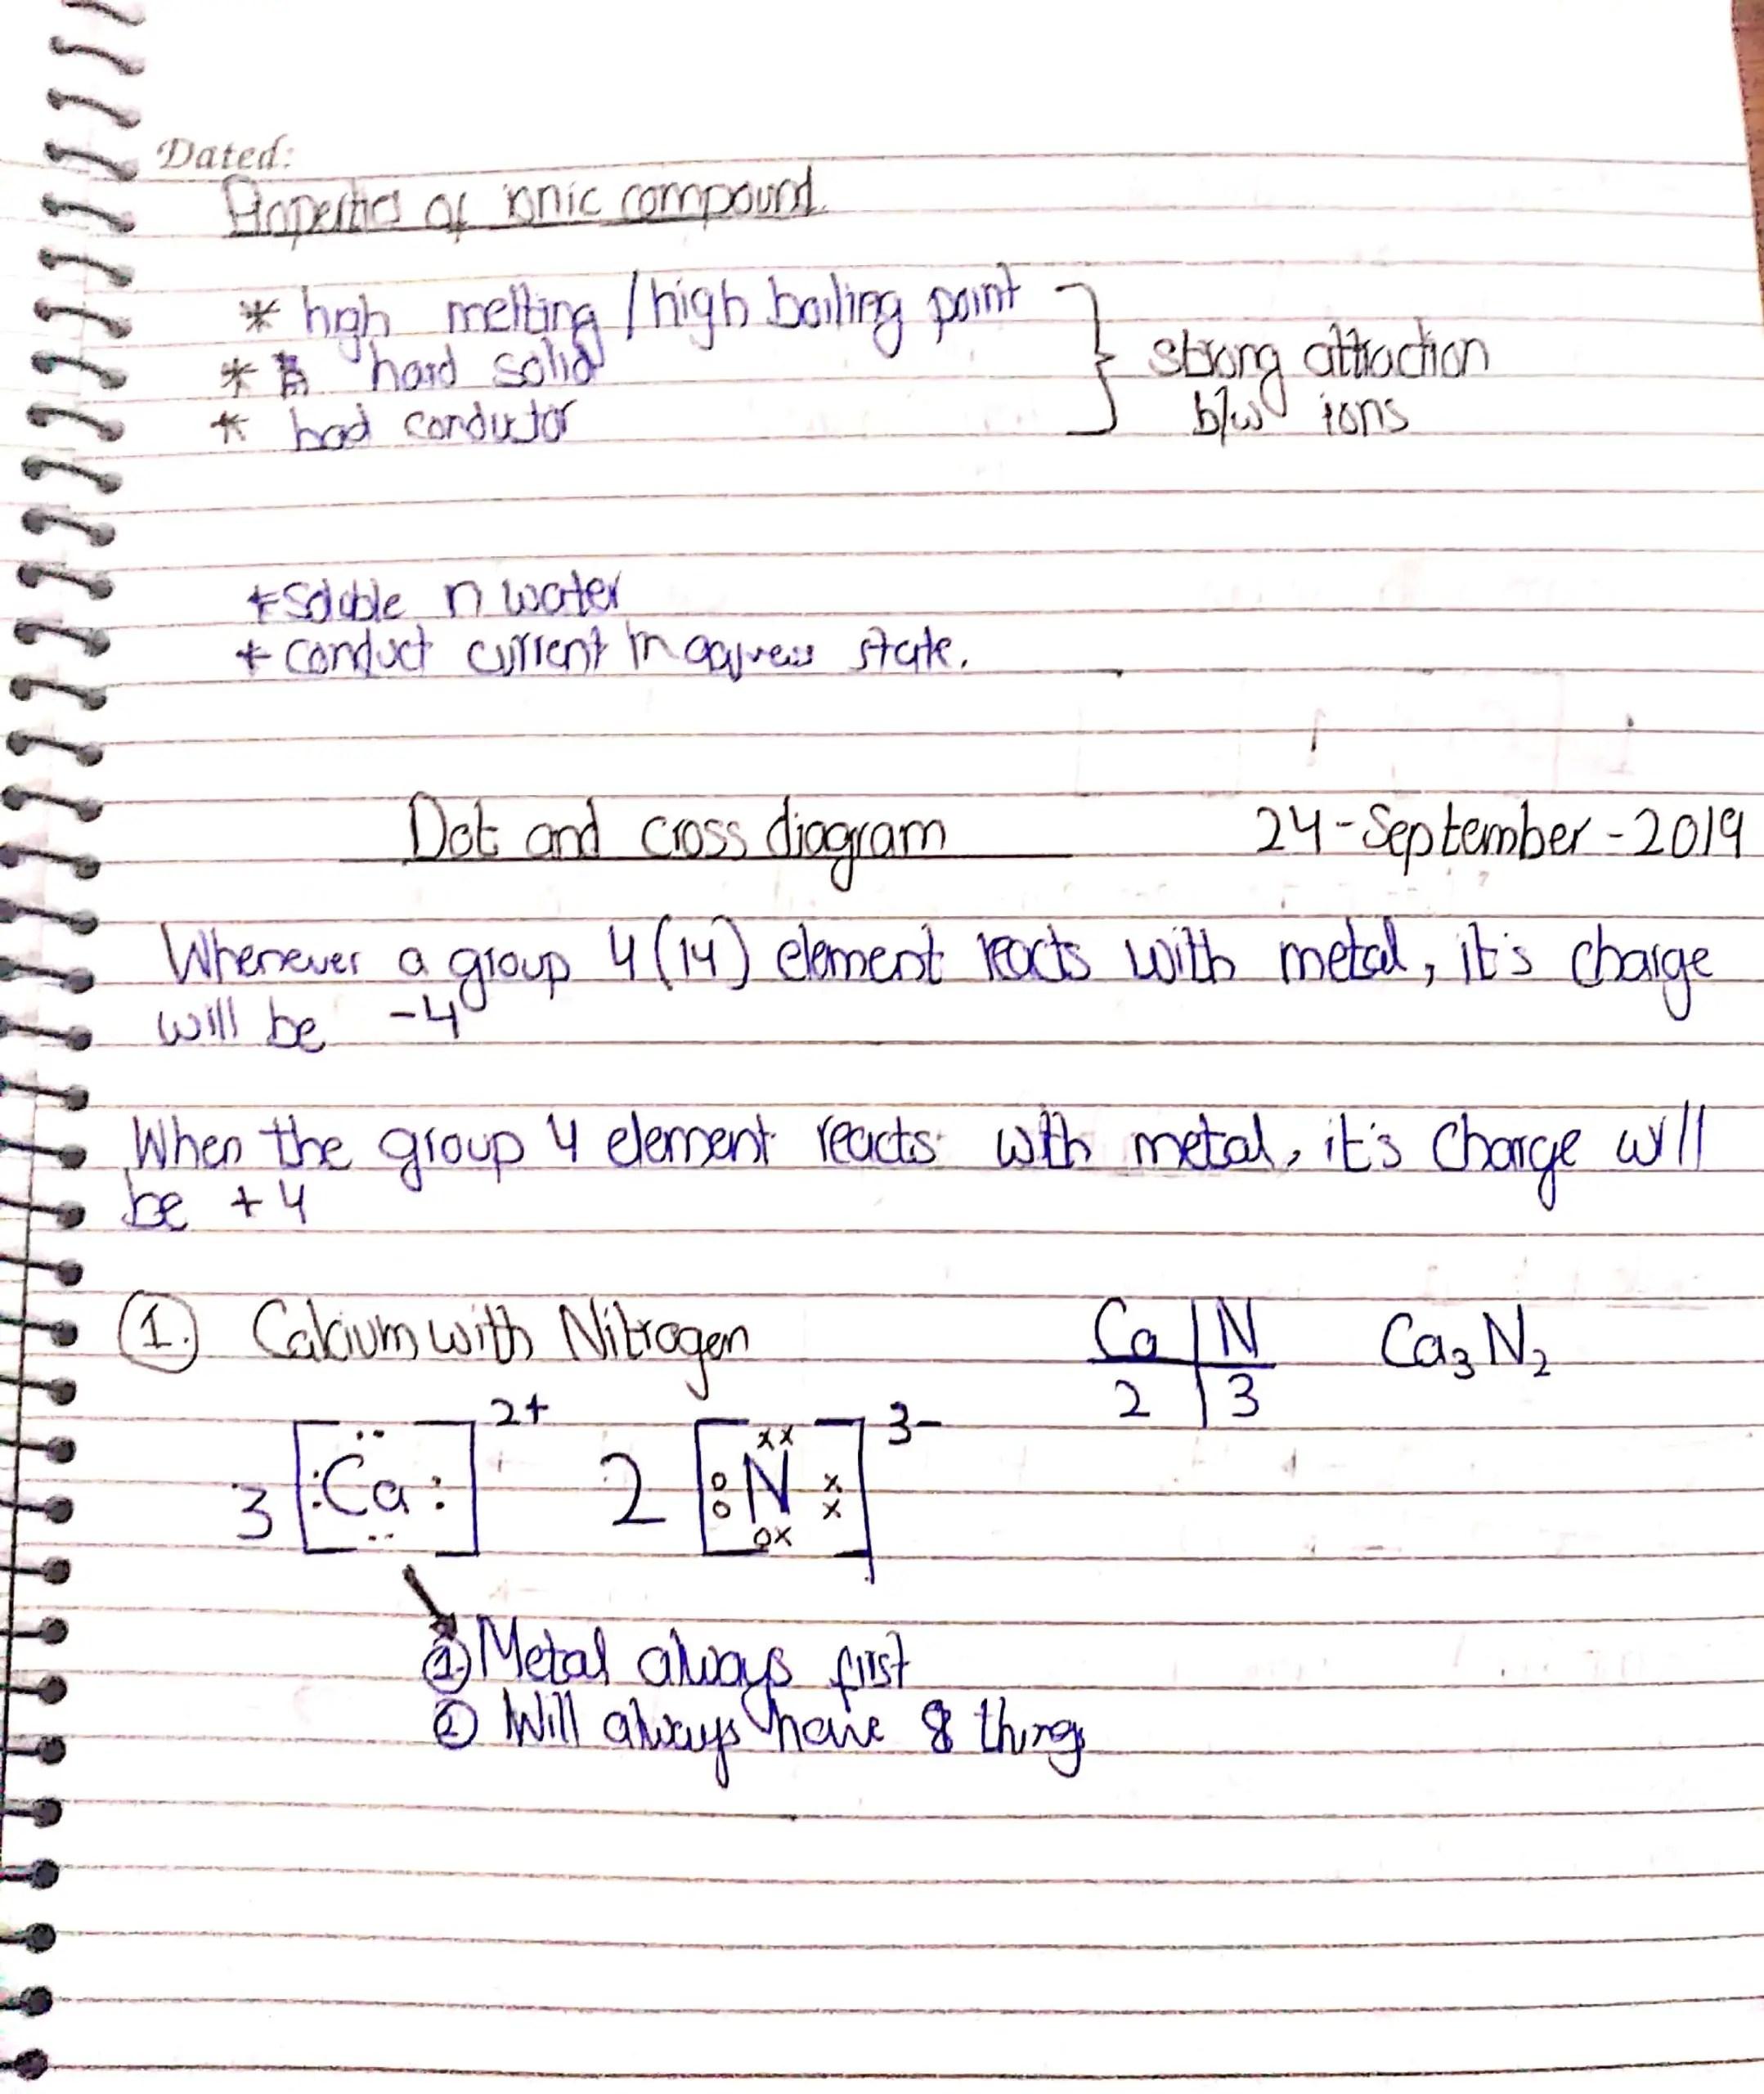 chemical bonding Sir Kashif_6